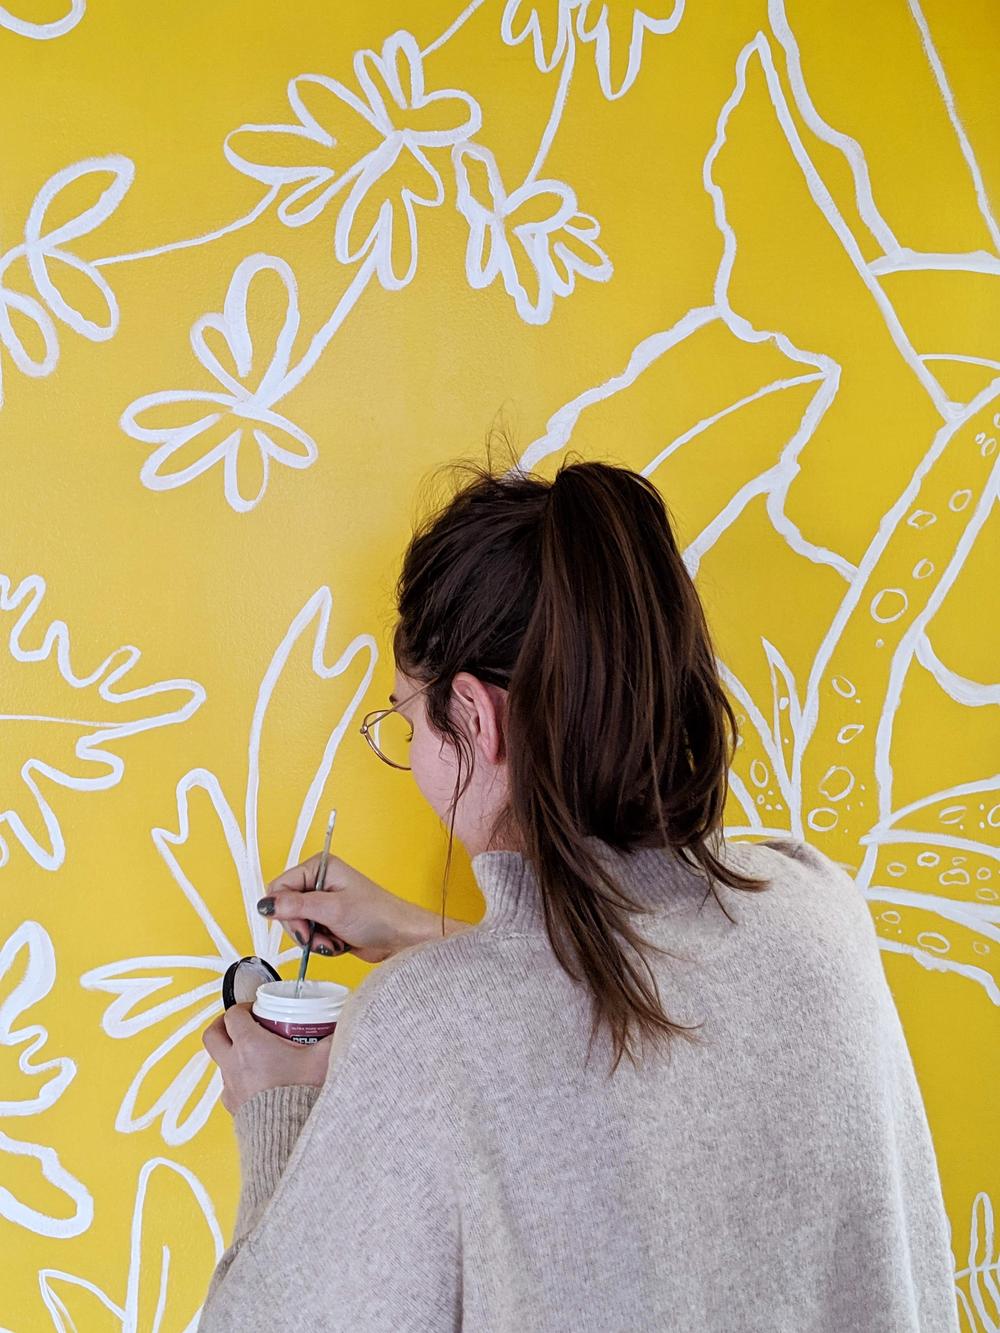 03 2019_Yellow Mural UES_02.png